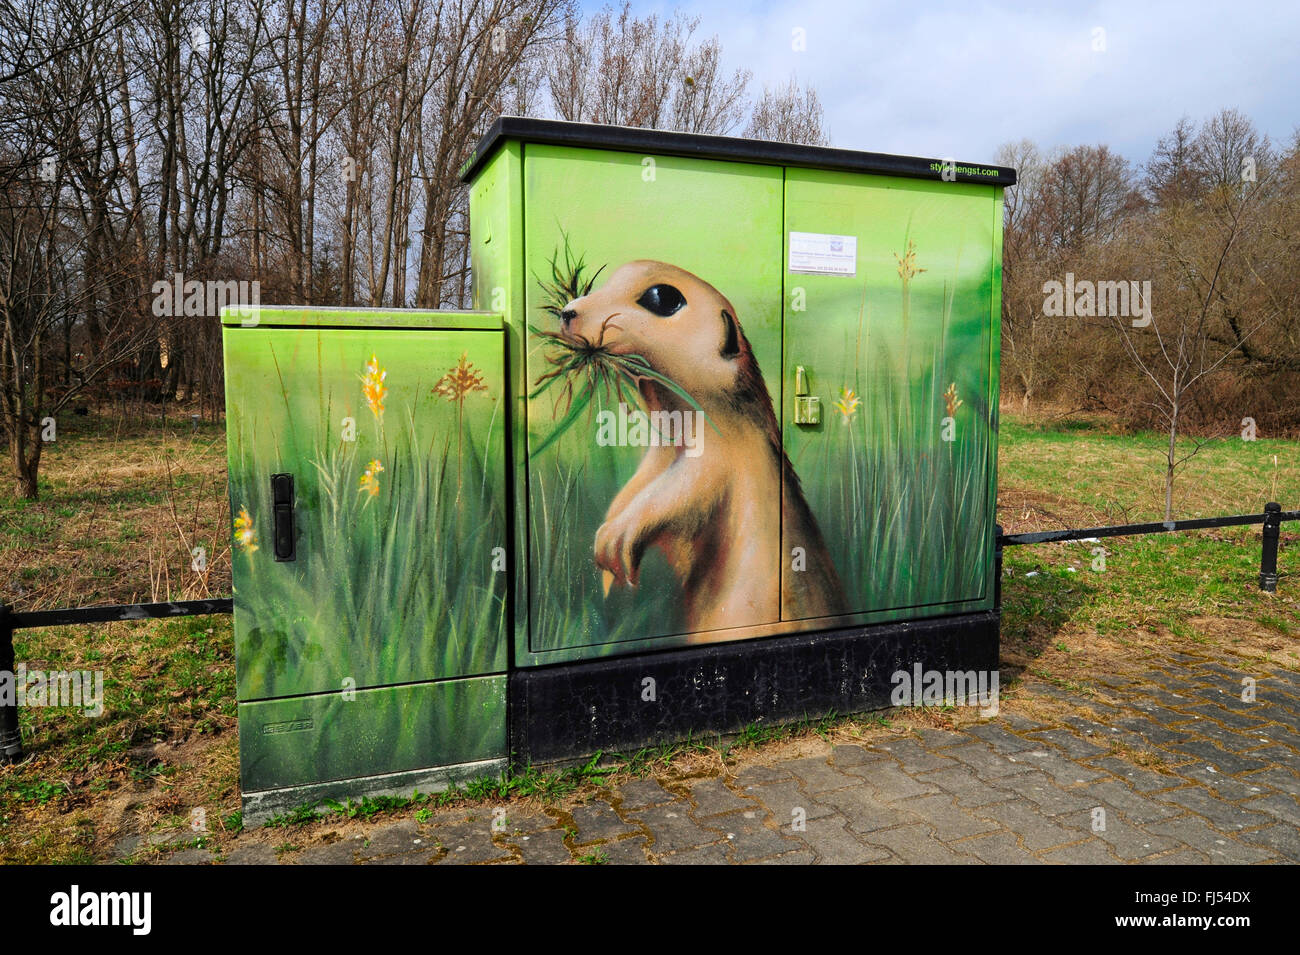 ground squirrels, susliks, sousliks (Citellus spec., Spermophilus spec.), painted on a power distribution board, Stock Photo